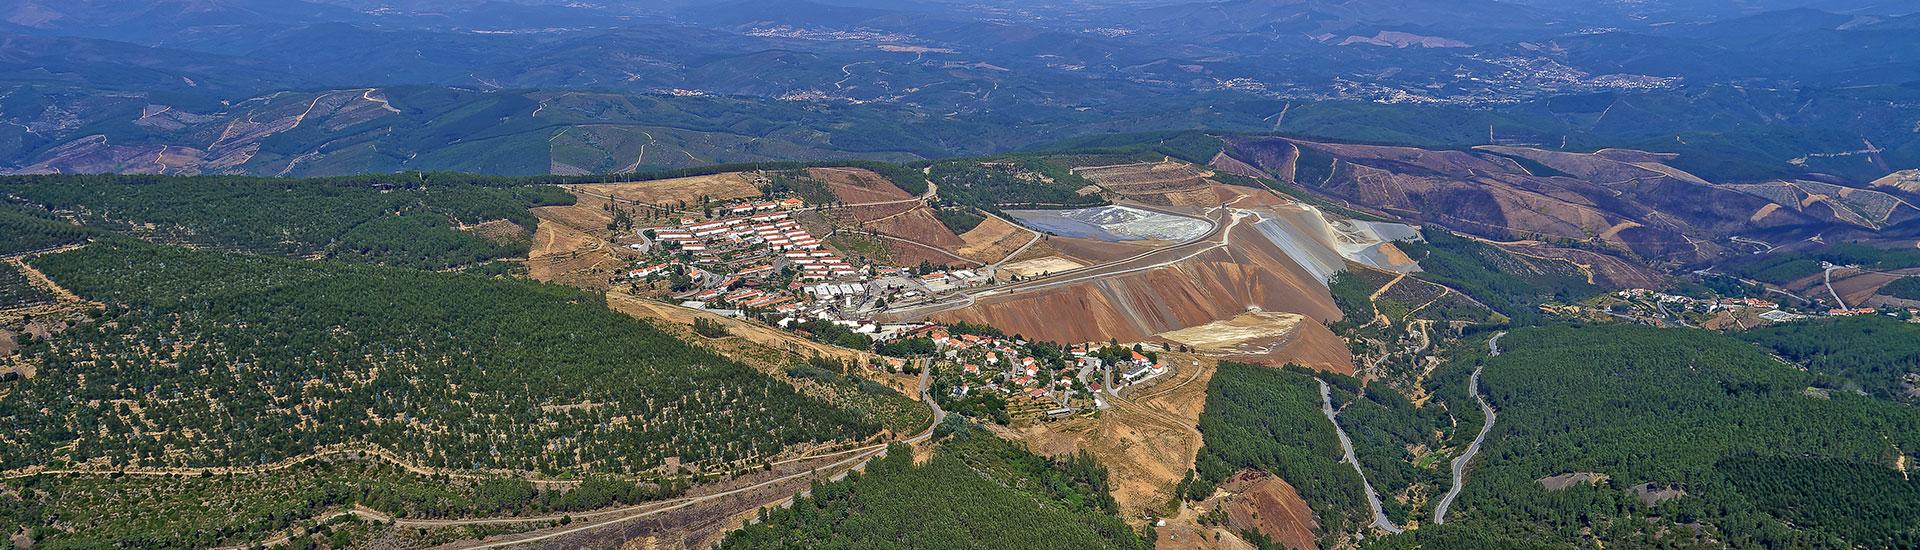 Panasqueira Tin Tungsten Mine